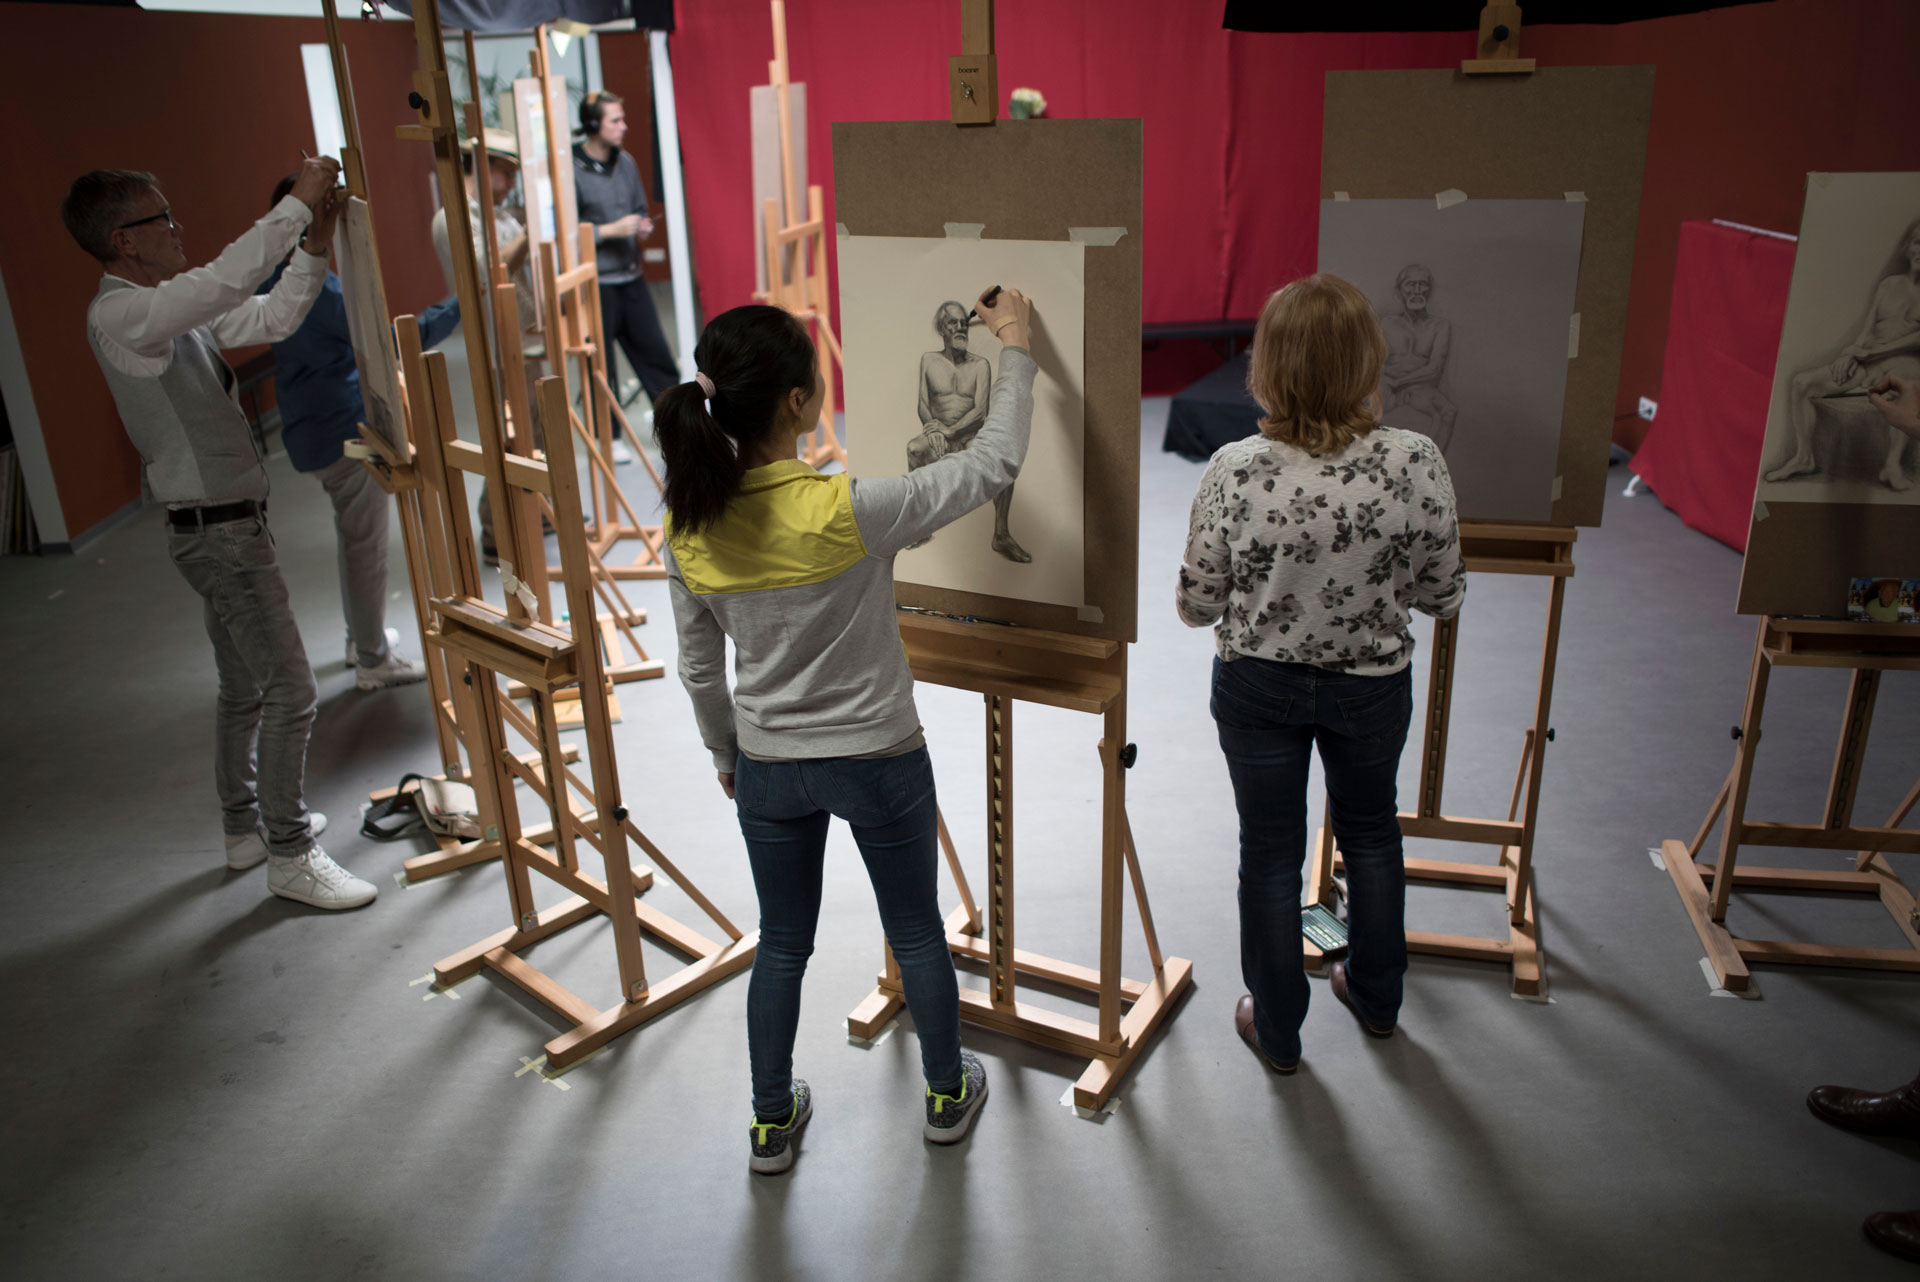 academy aktkurs 05 - Growing dissatisfaction among German art students - Interview